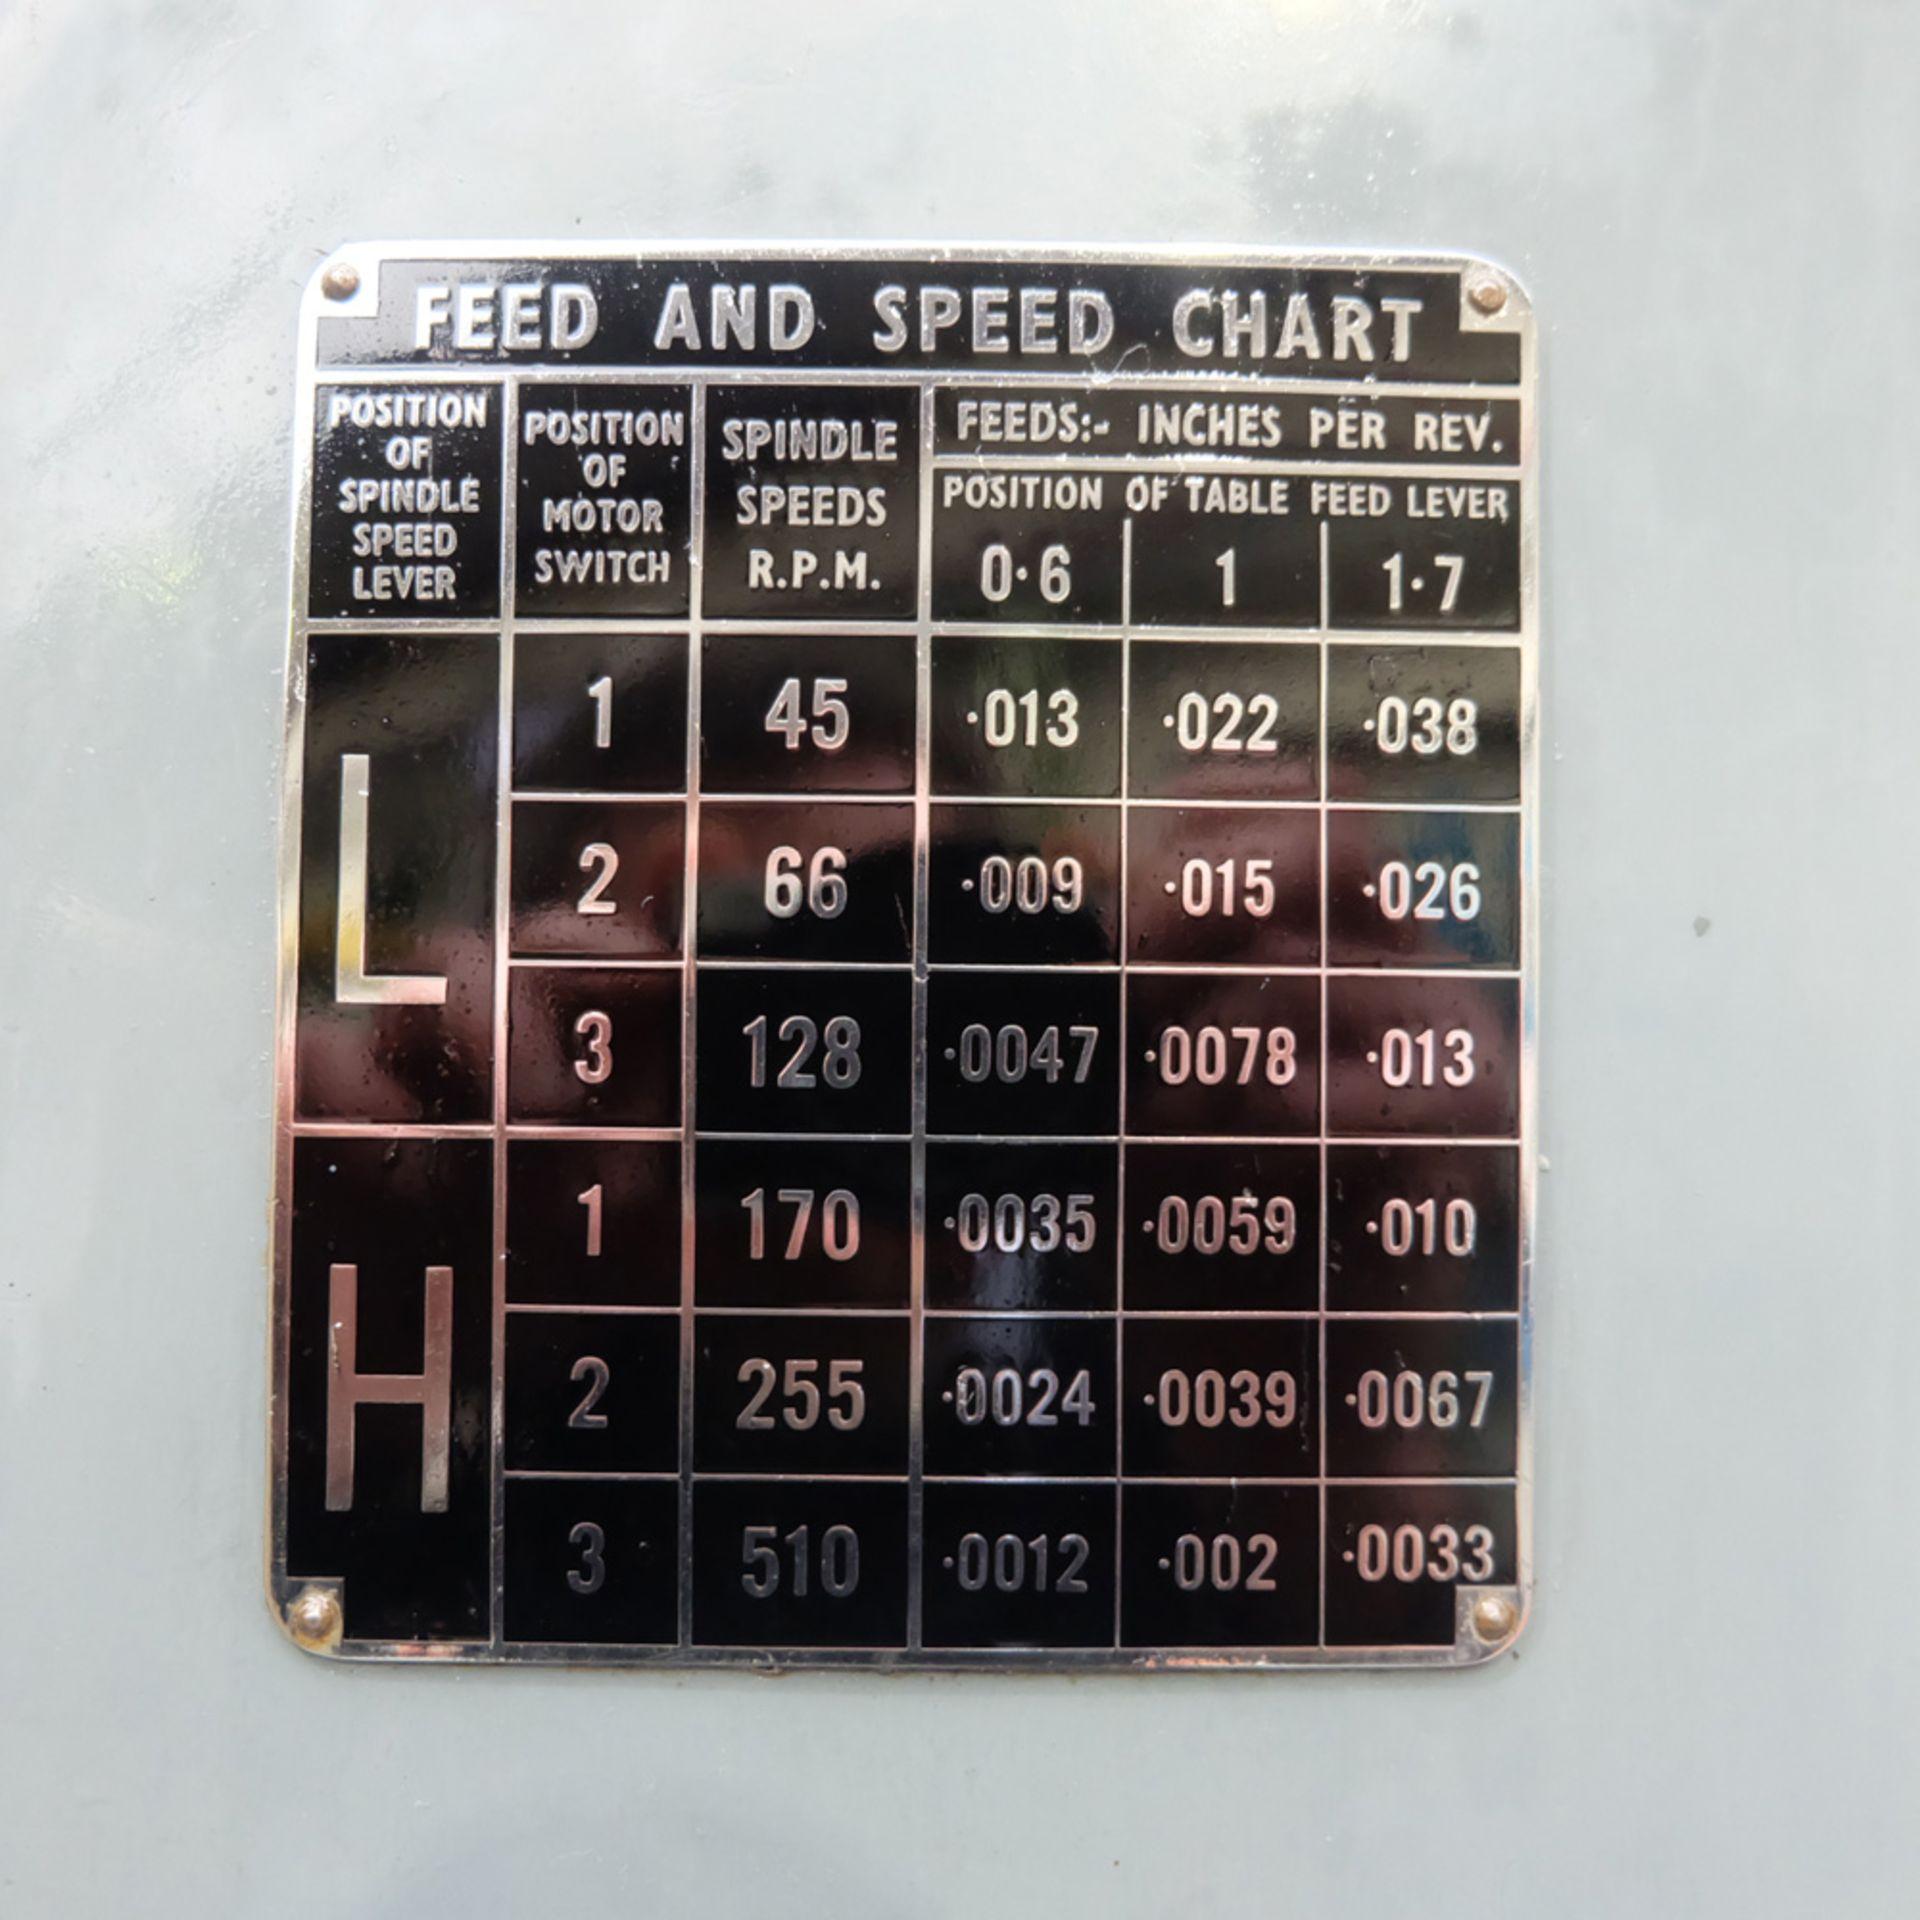 "Kearns S Type Facing Chuck Model Horizontal Boring Machine. Facing Chuck Capacity 8"". - Image 10 of 18"